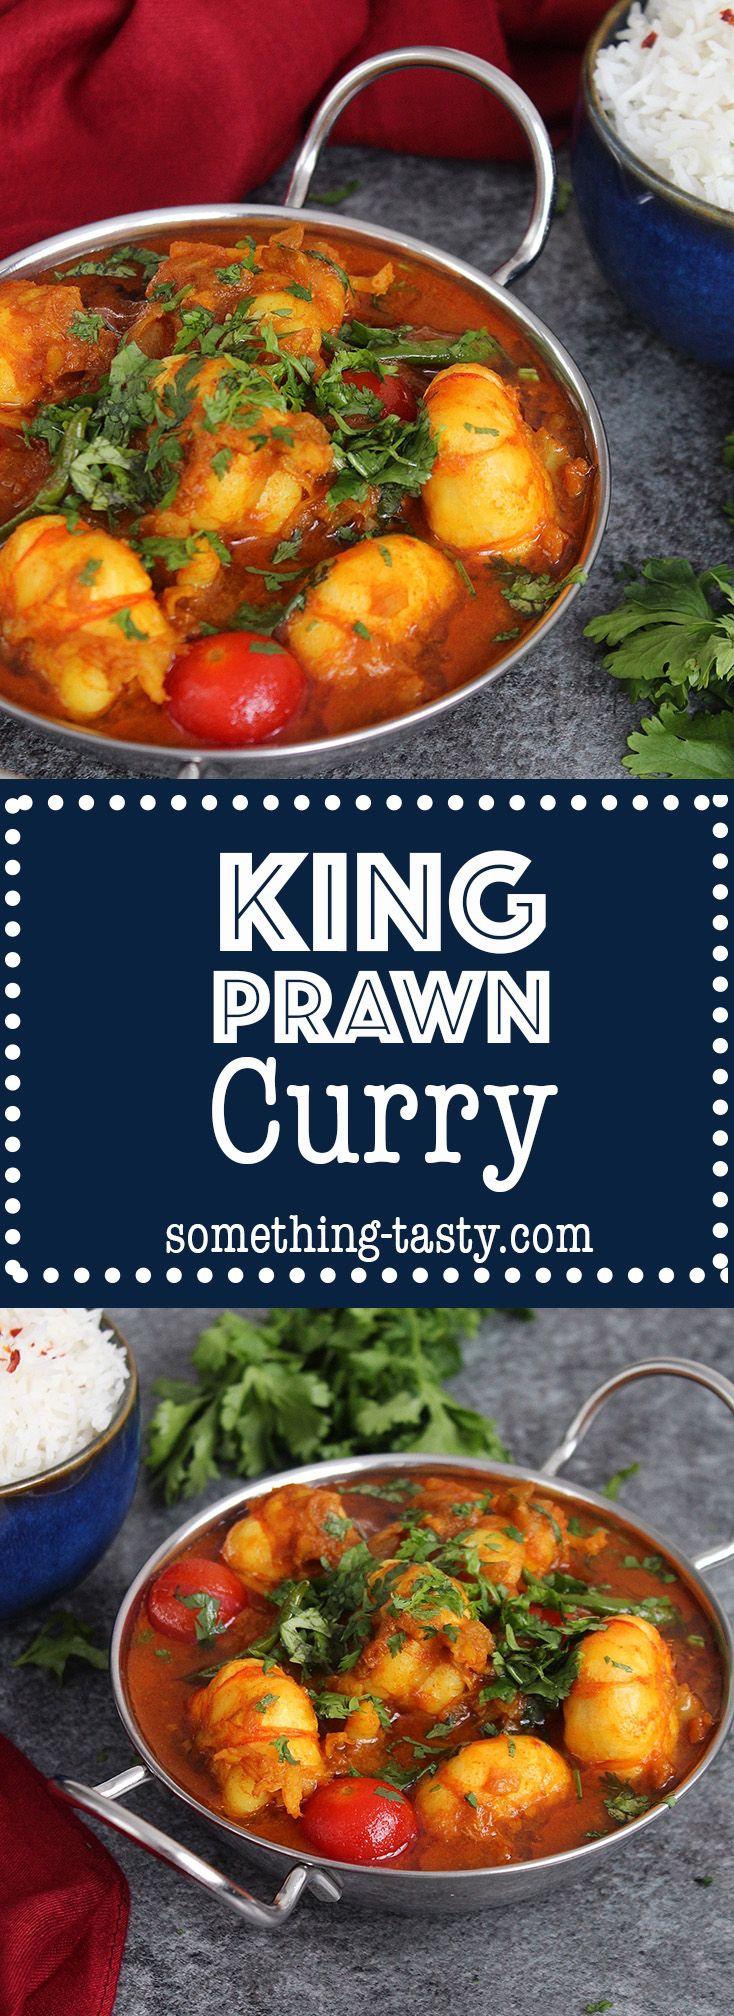 King Prawn Curry. From Something Tasty Blog.